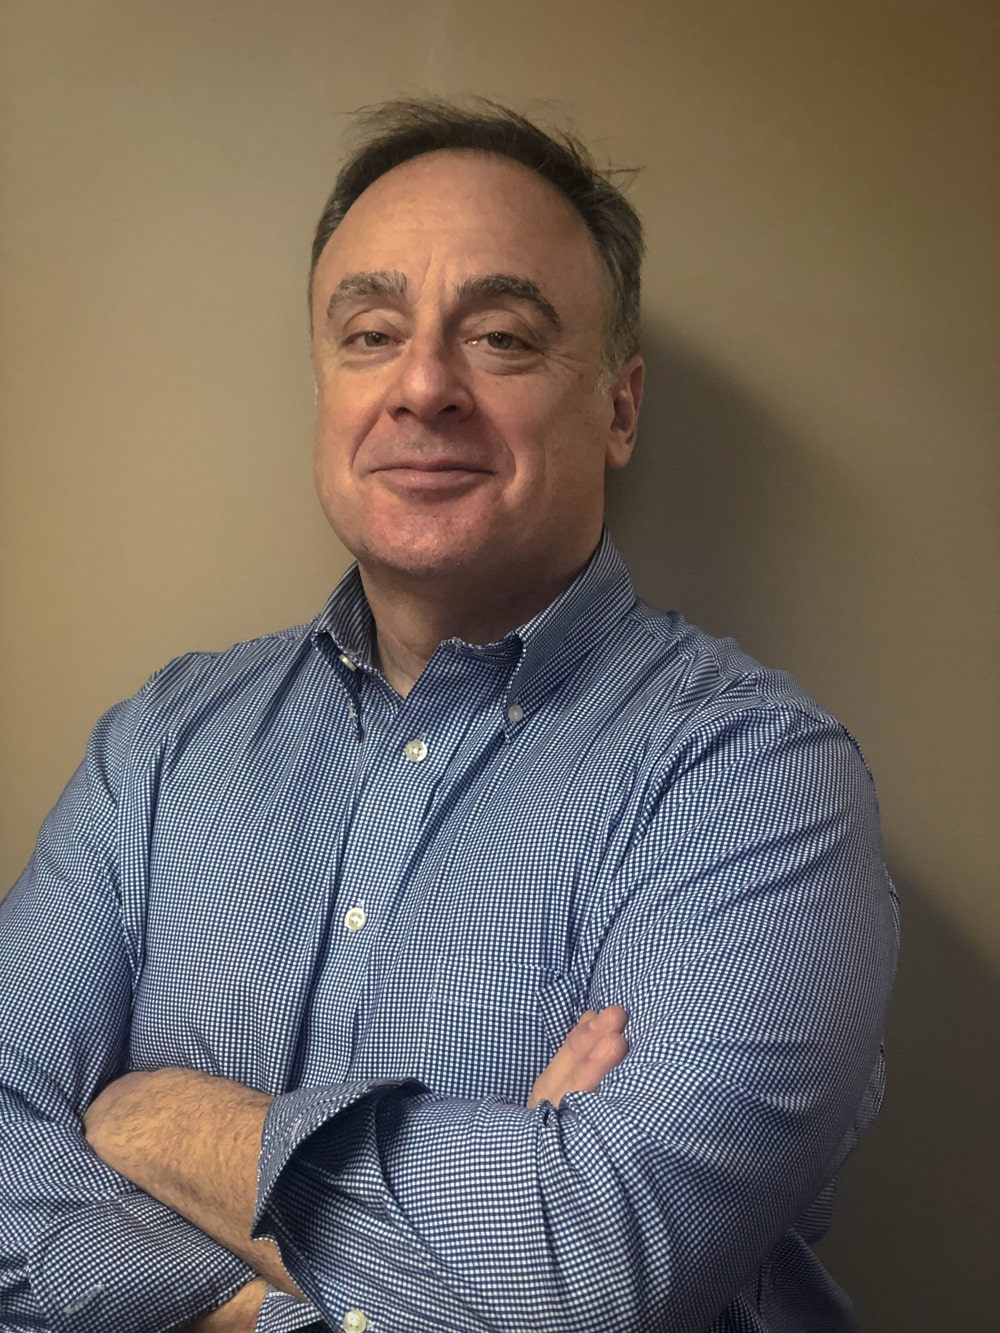 Dr. Brandon Becker